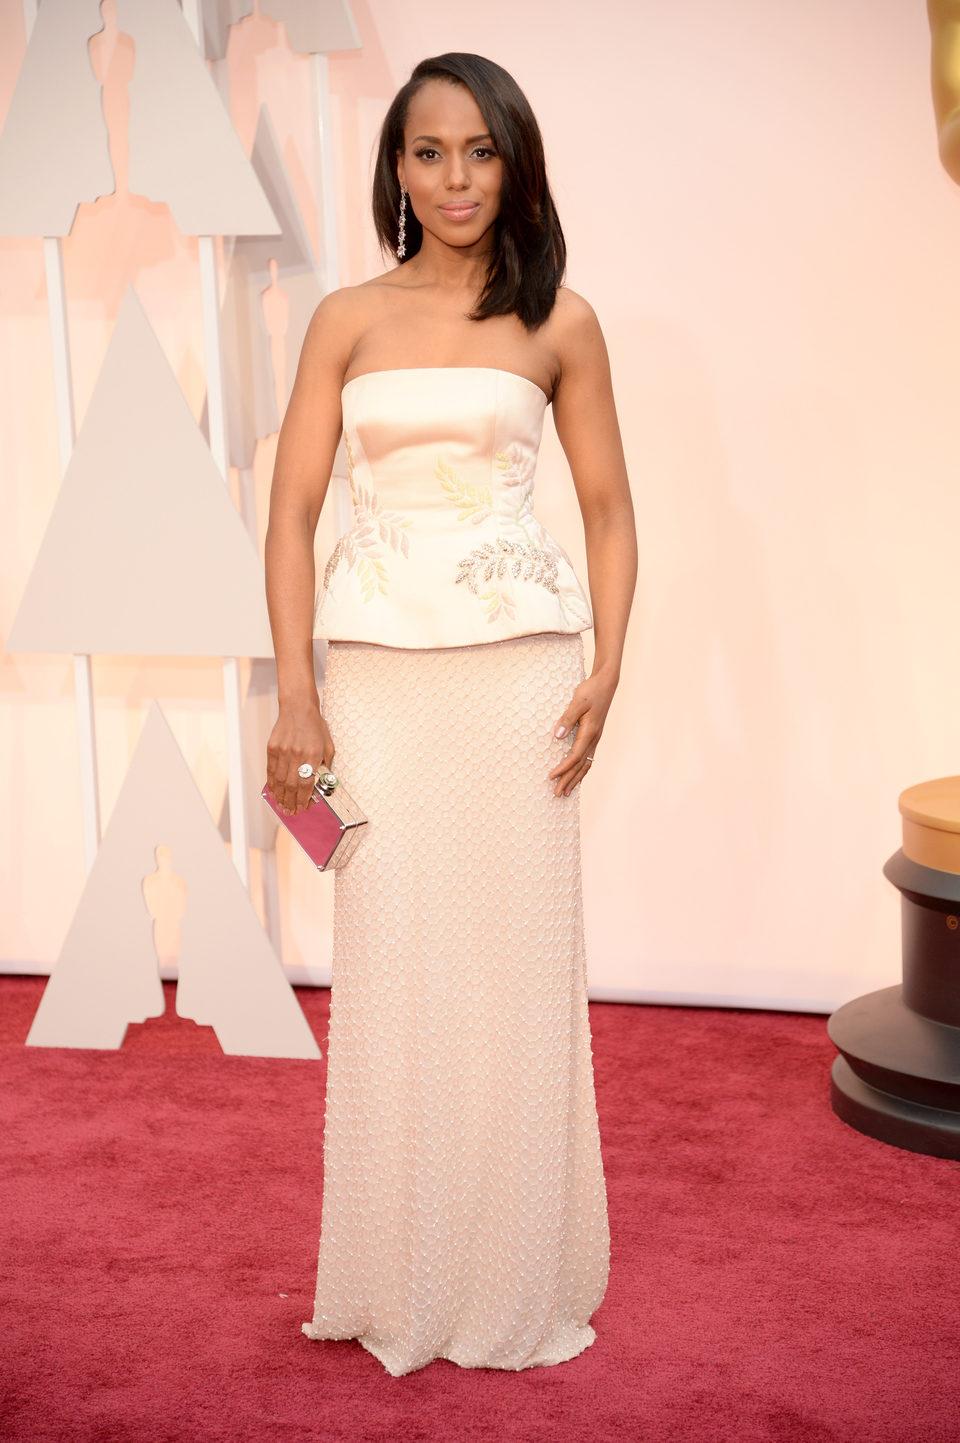 Kerry Washington at the Oscar 2015 red carpet